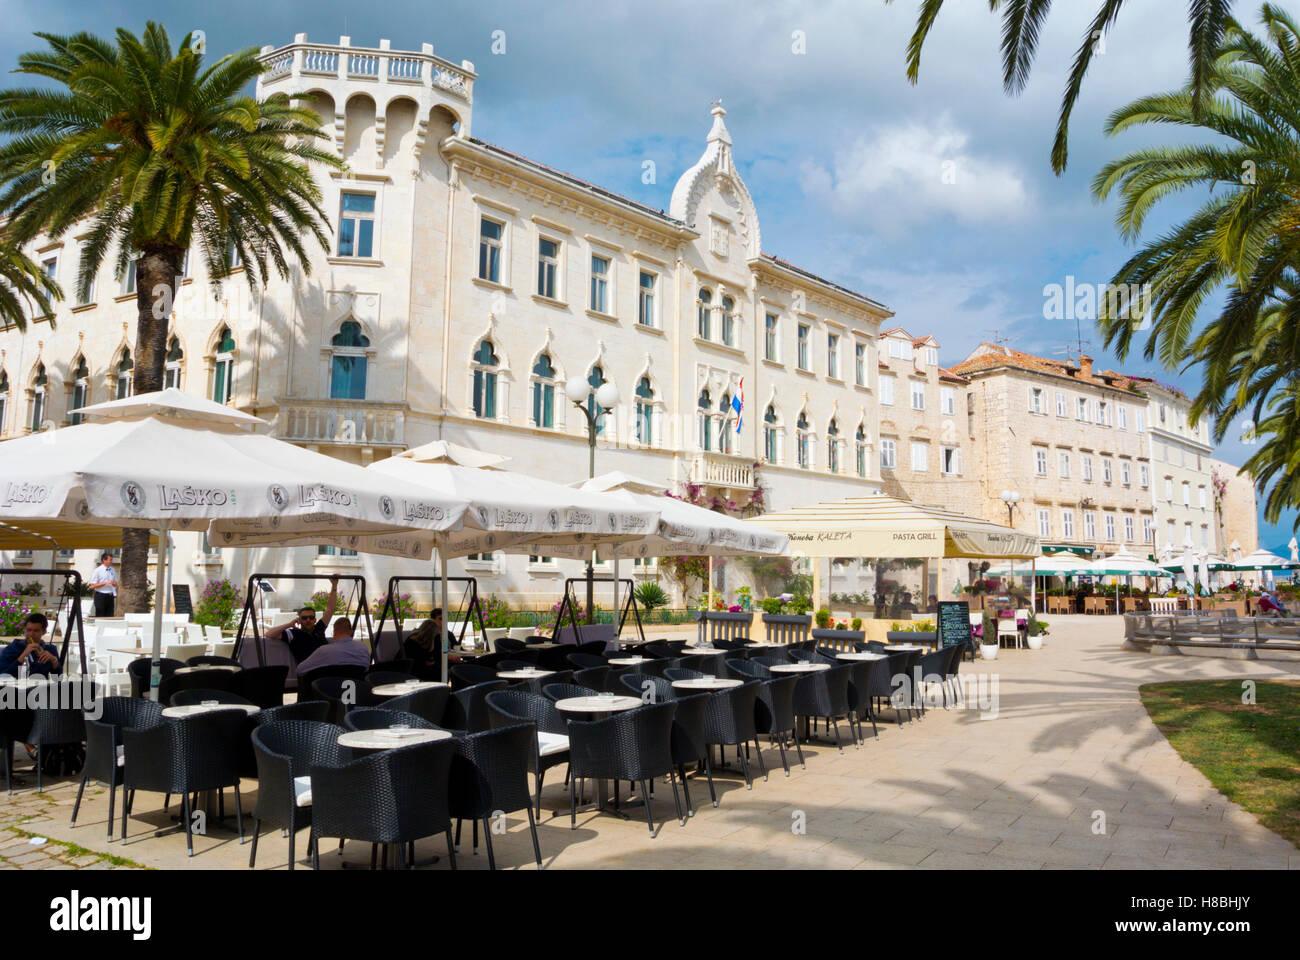 Obala bana Berislavica, with Lucic palace, seaside promenade, old town, Trogir, Dalmatia, Croatia Stock Photo